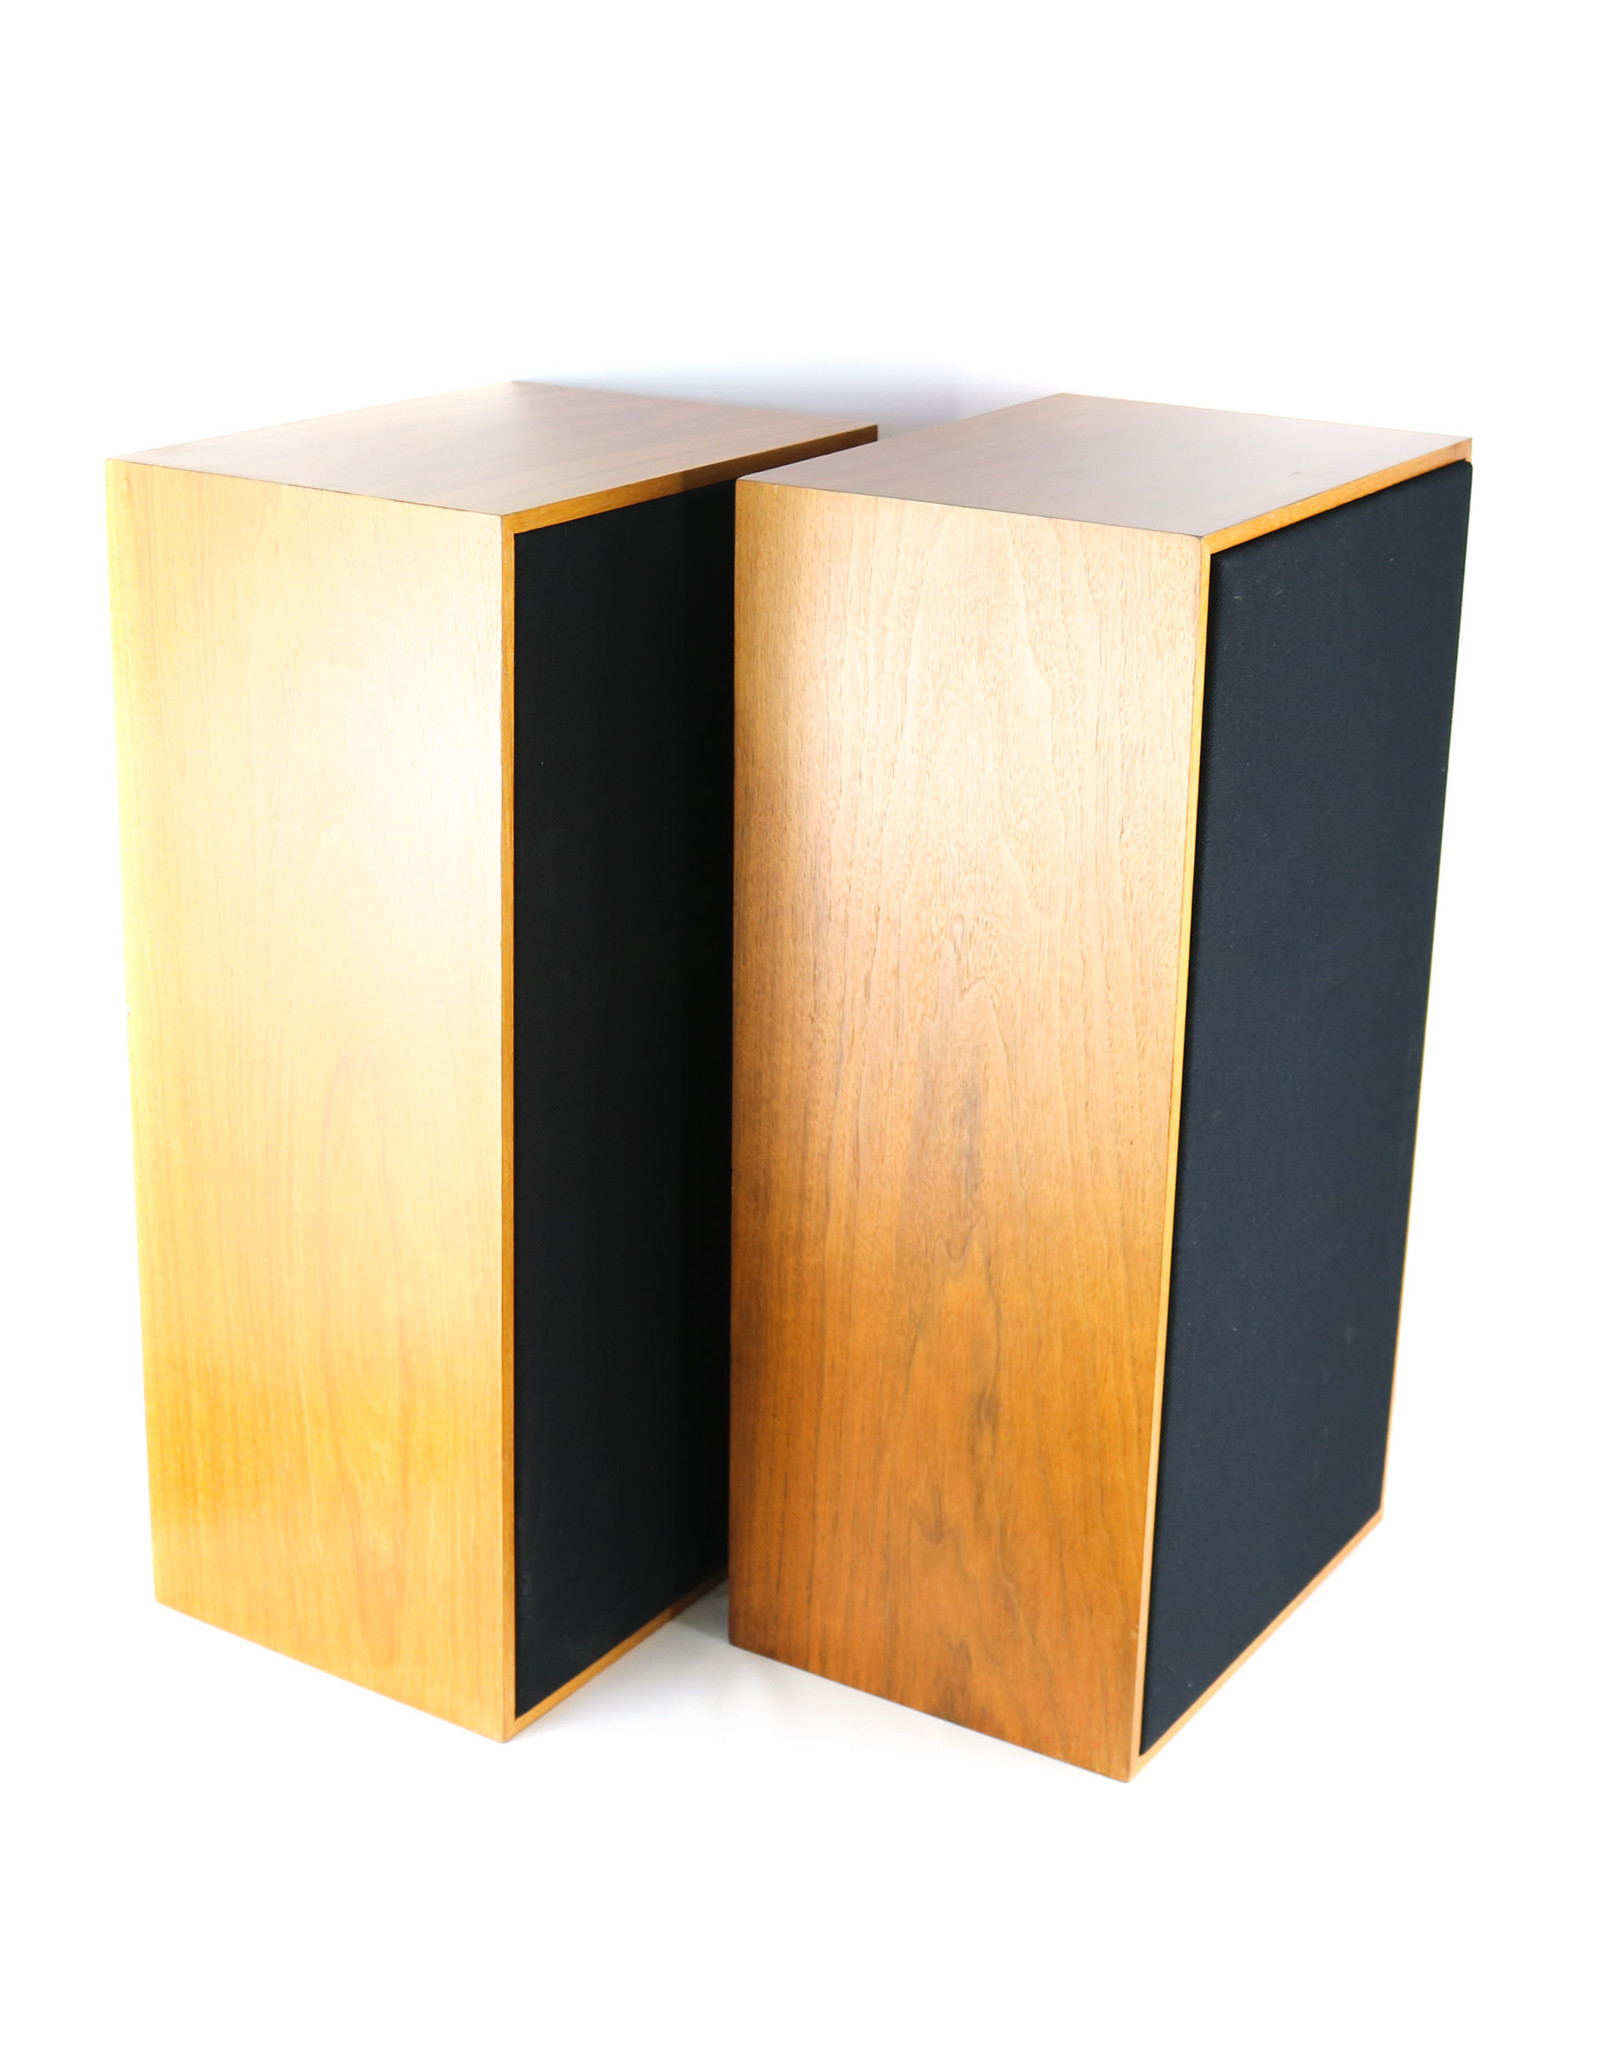 KEF KEF 104aB Standmount Speakers USED